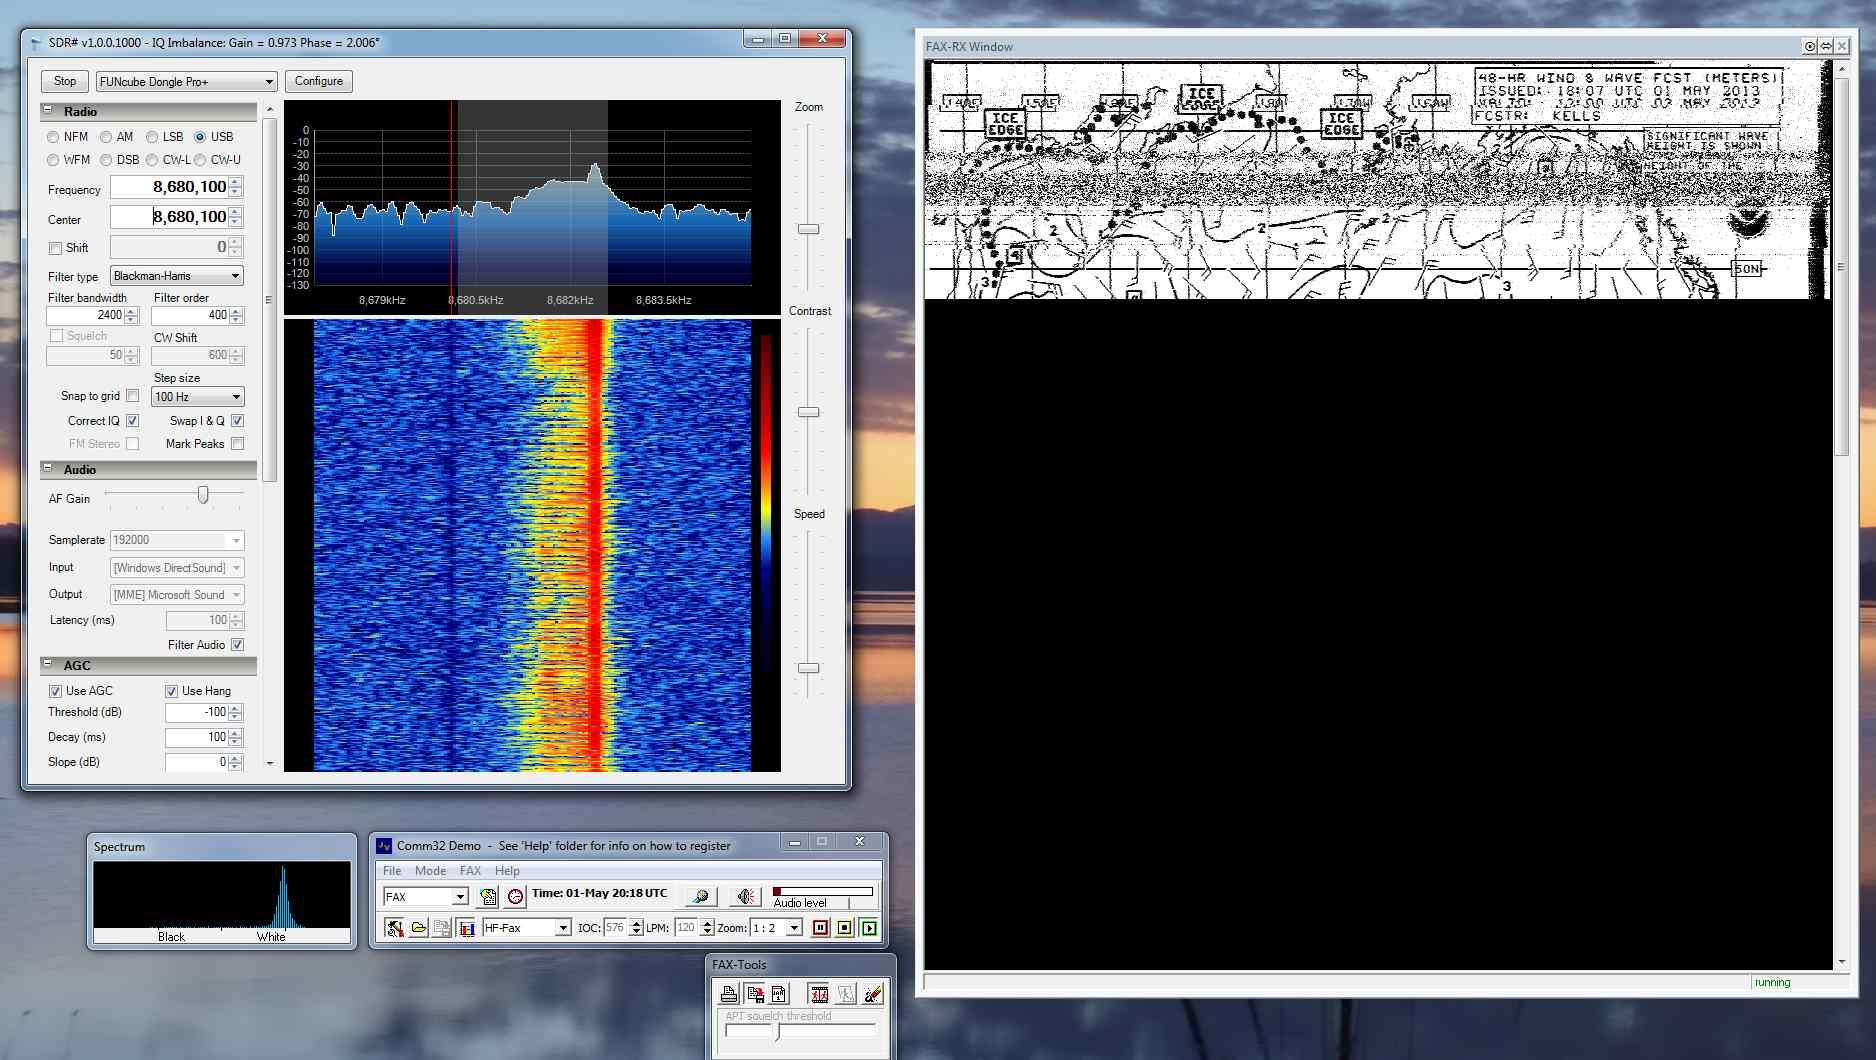 Wfax Reception Using Software Defined Radio